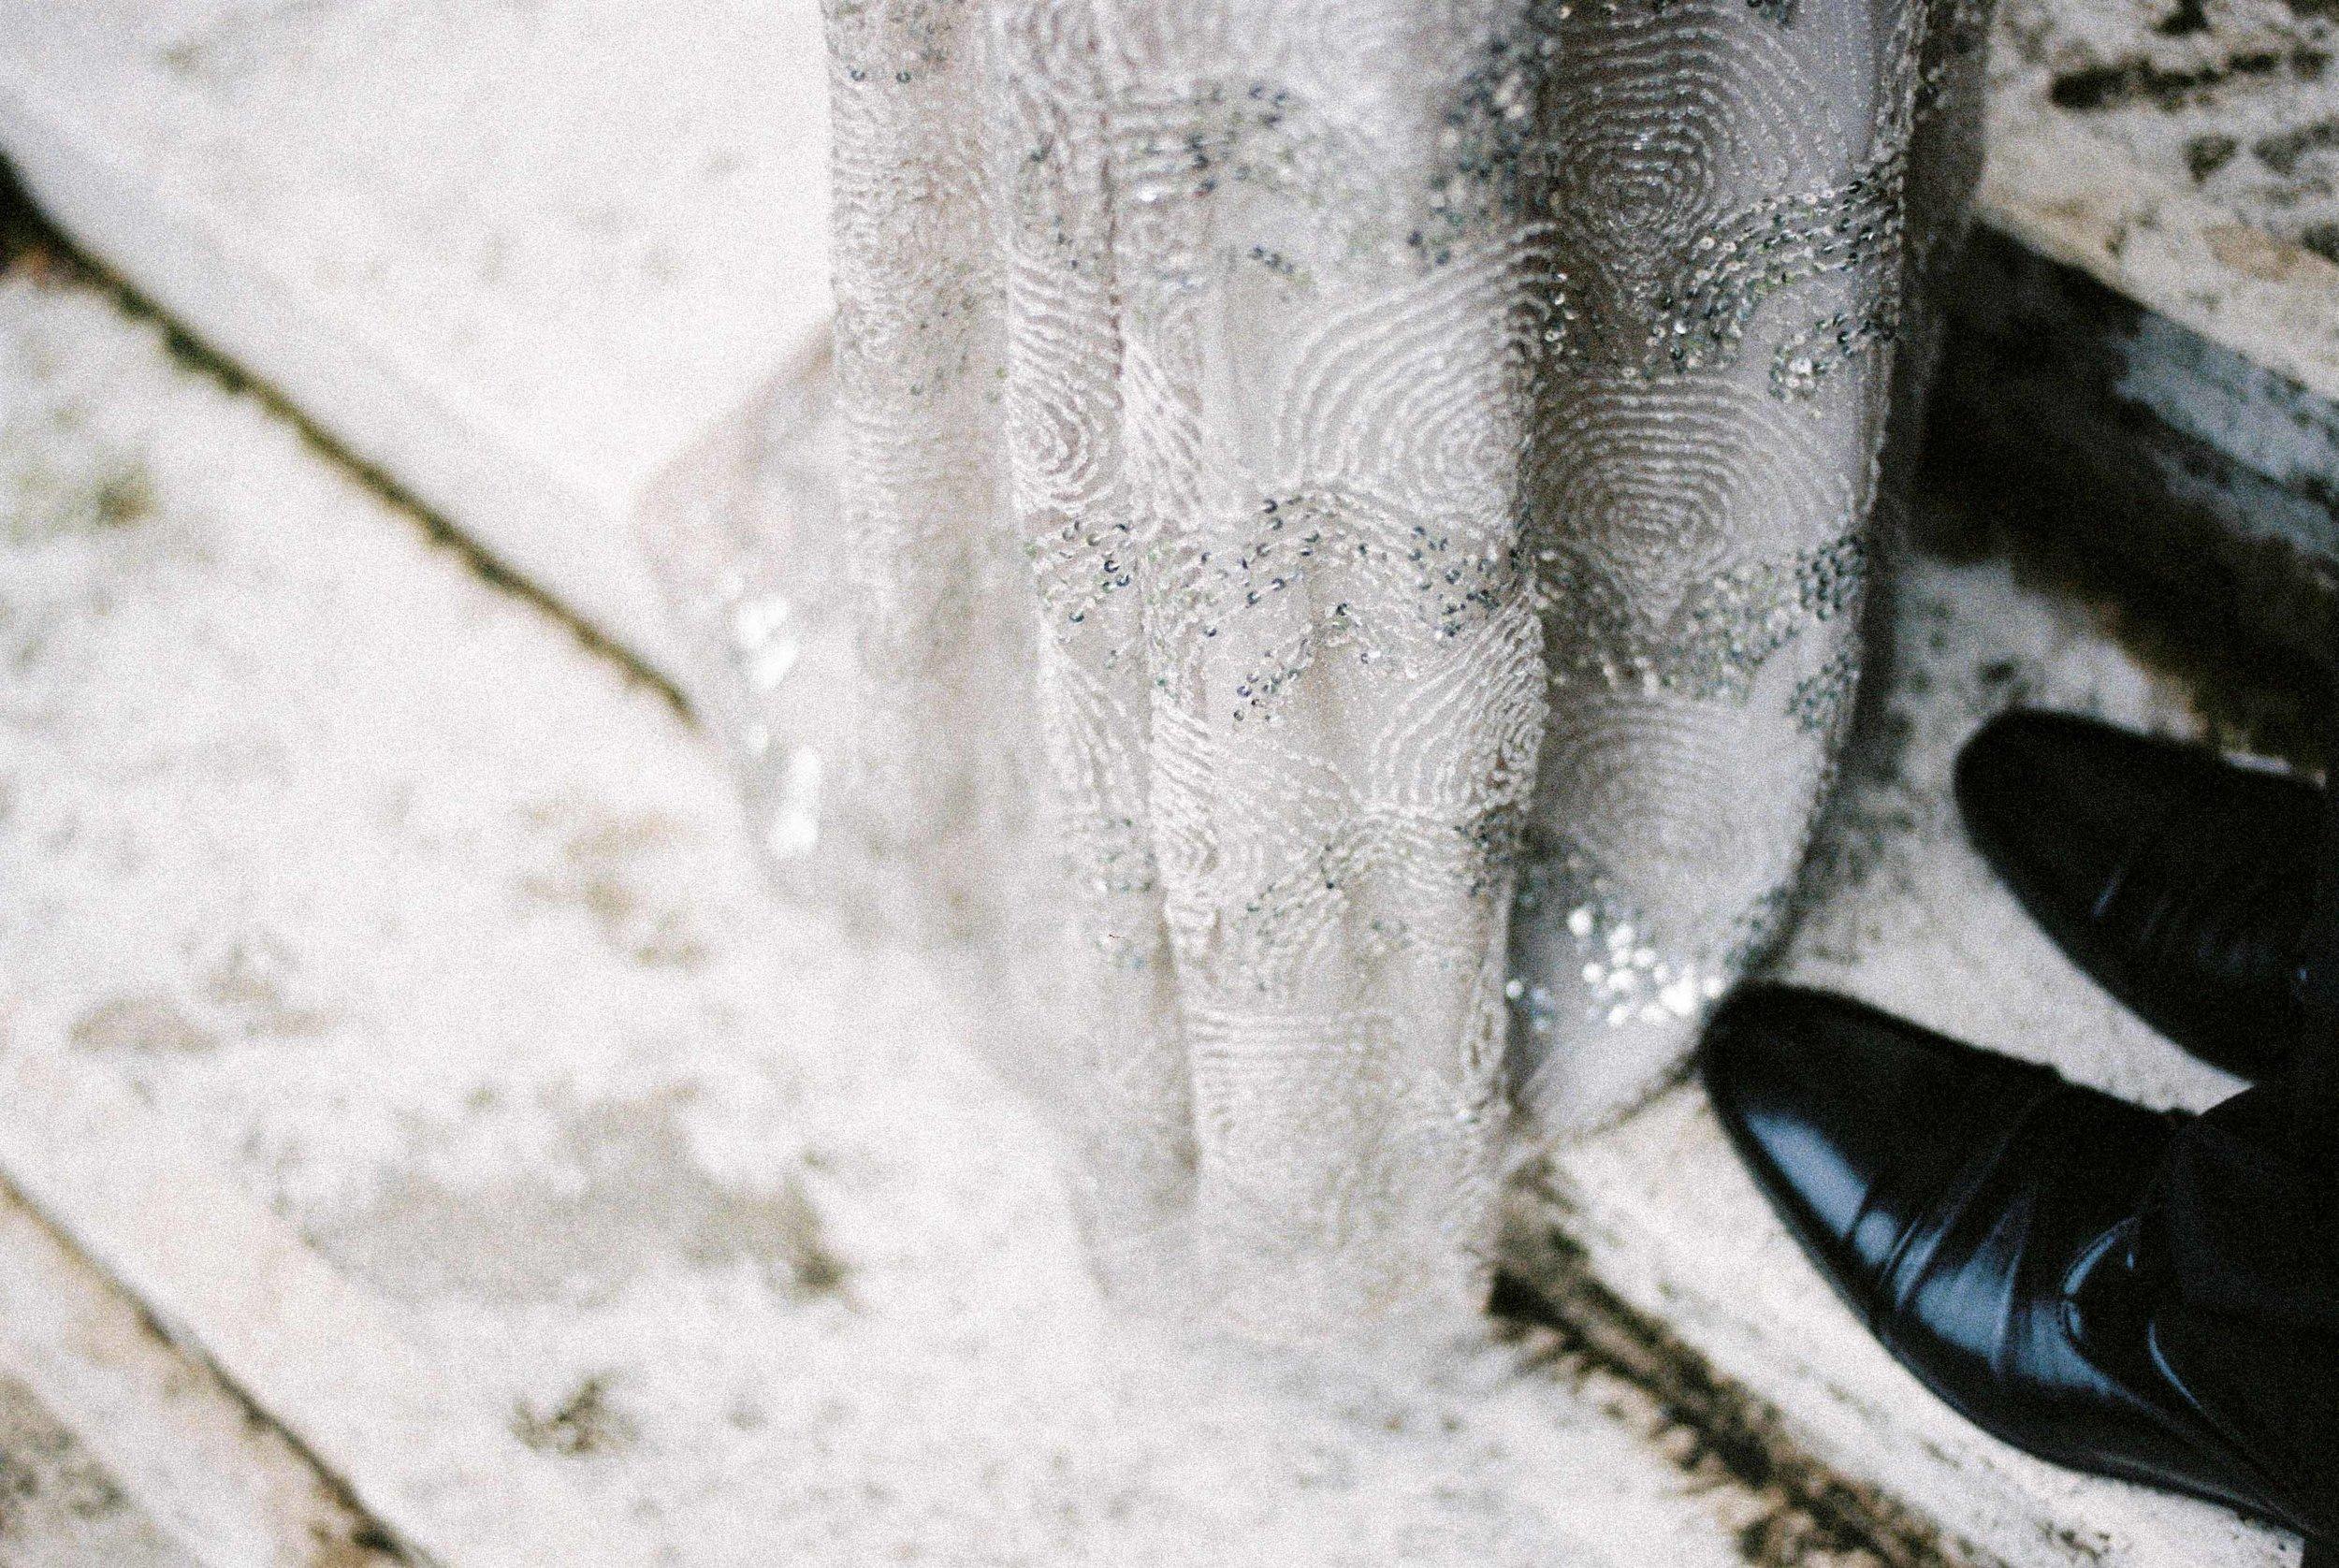 eskuvo-menyasszonyi-ruha-daalarna-ezust-gatsby-strassz-styled-shoot.jpg